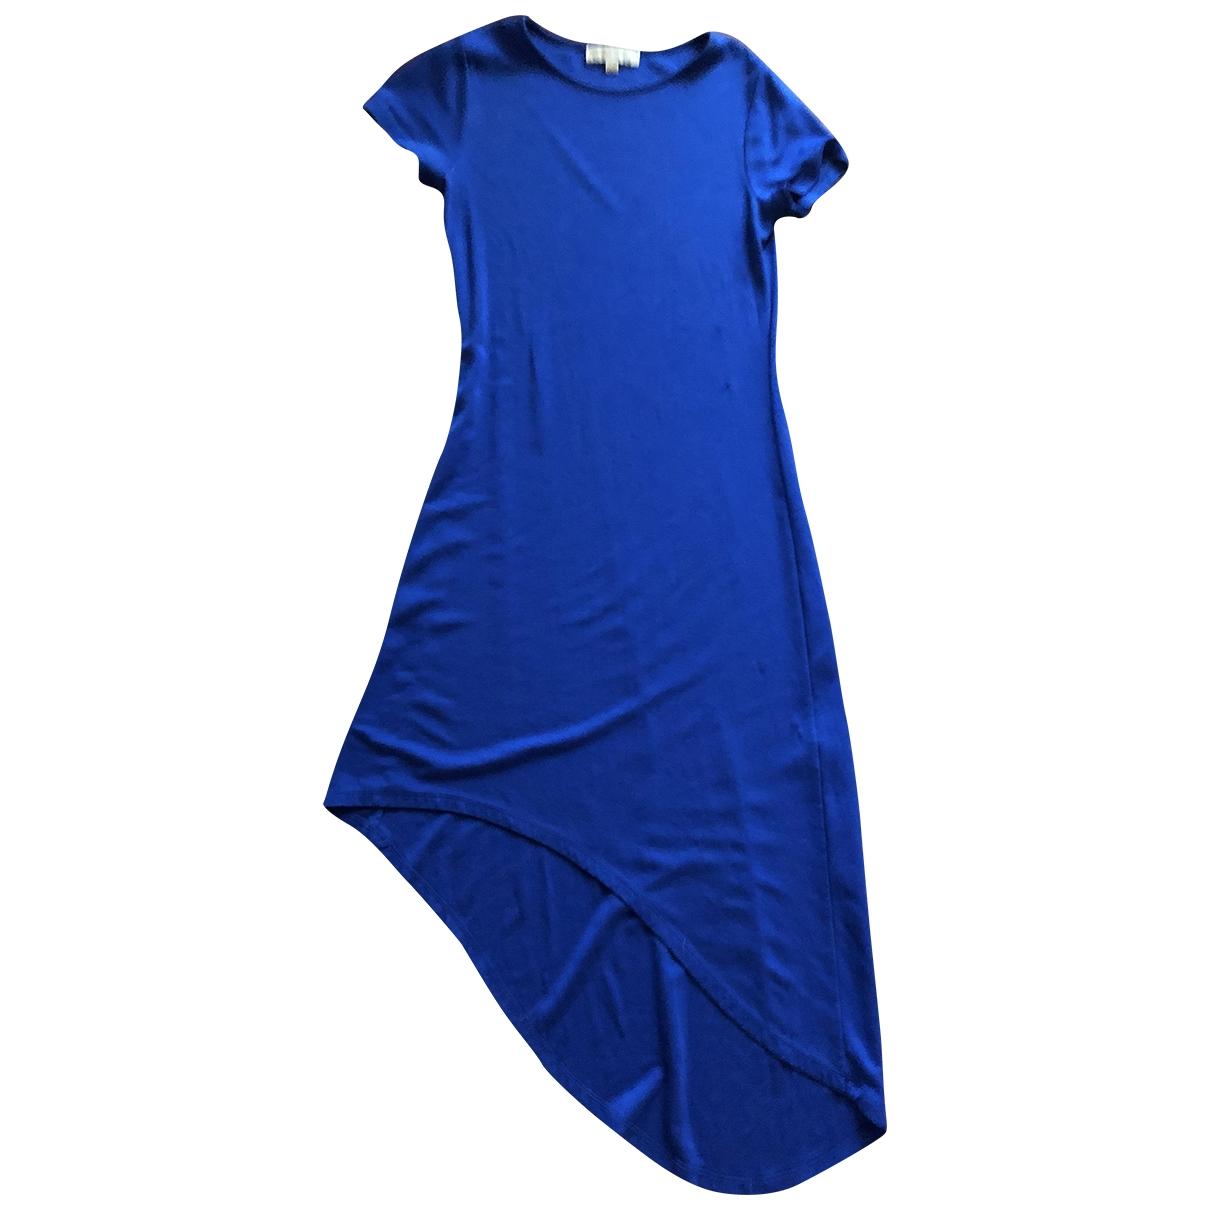 Michael Kors \N Blue Cotton dress for Women S International